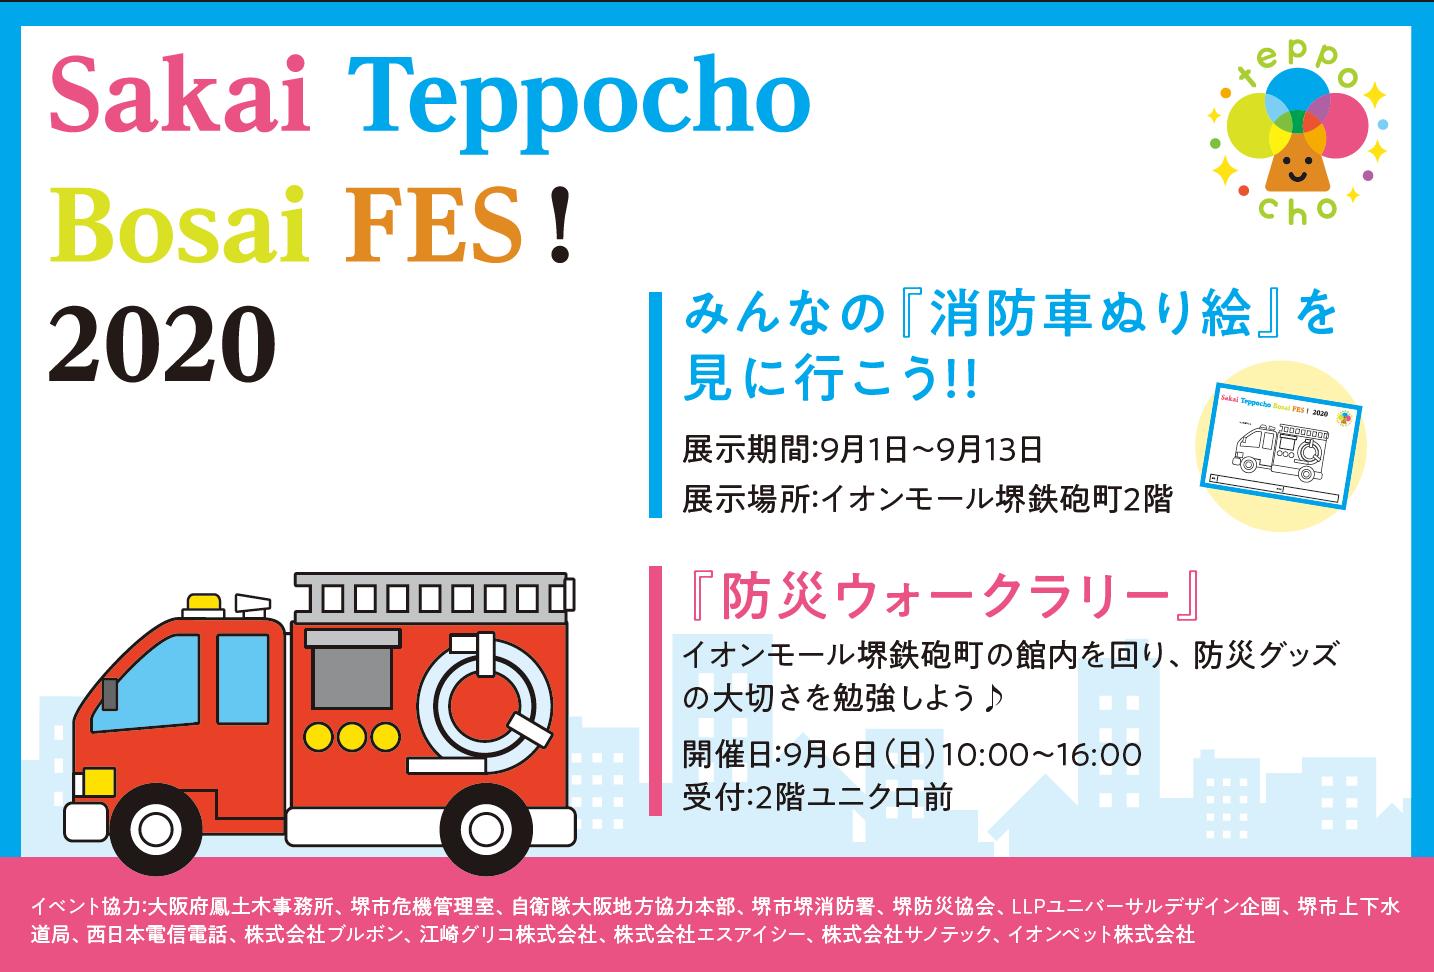 Sakai Teppocho Bosai FES ! 2020  の裏面解答